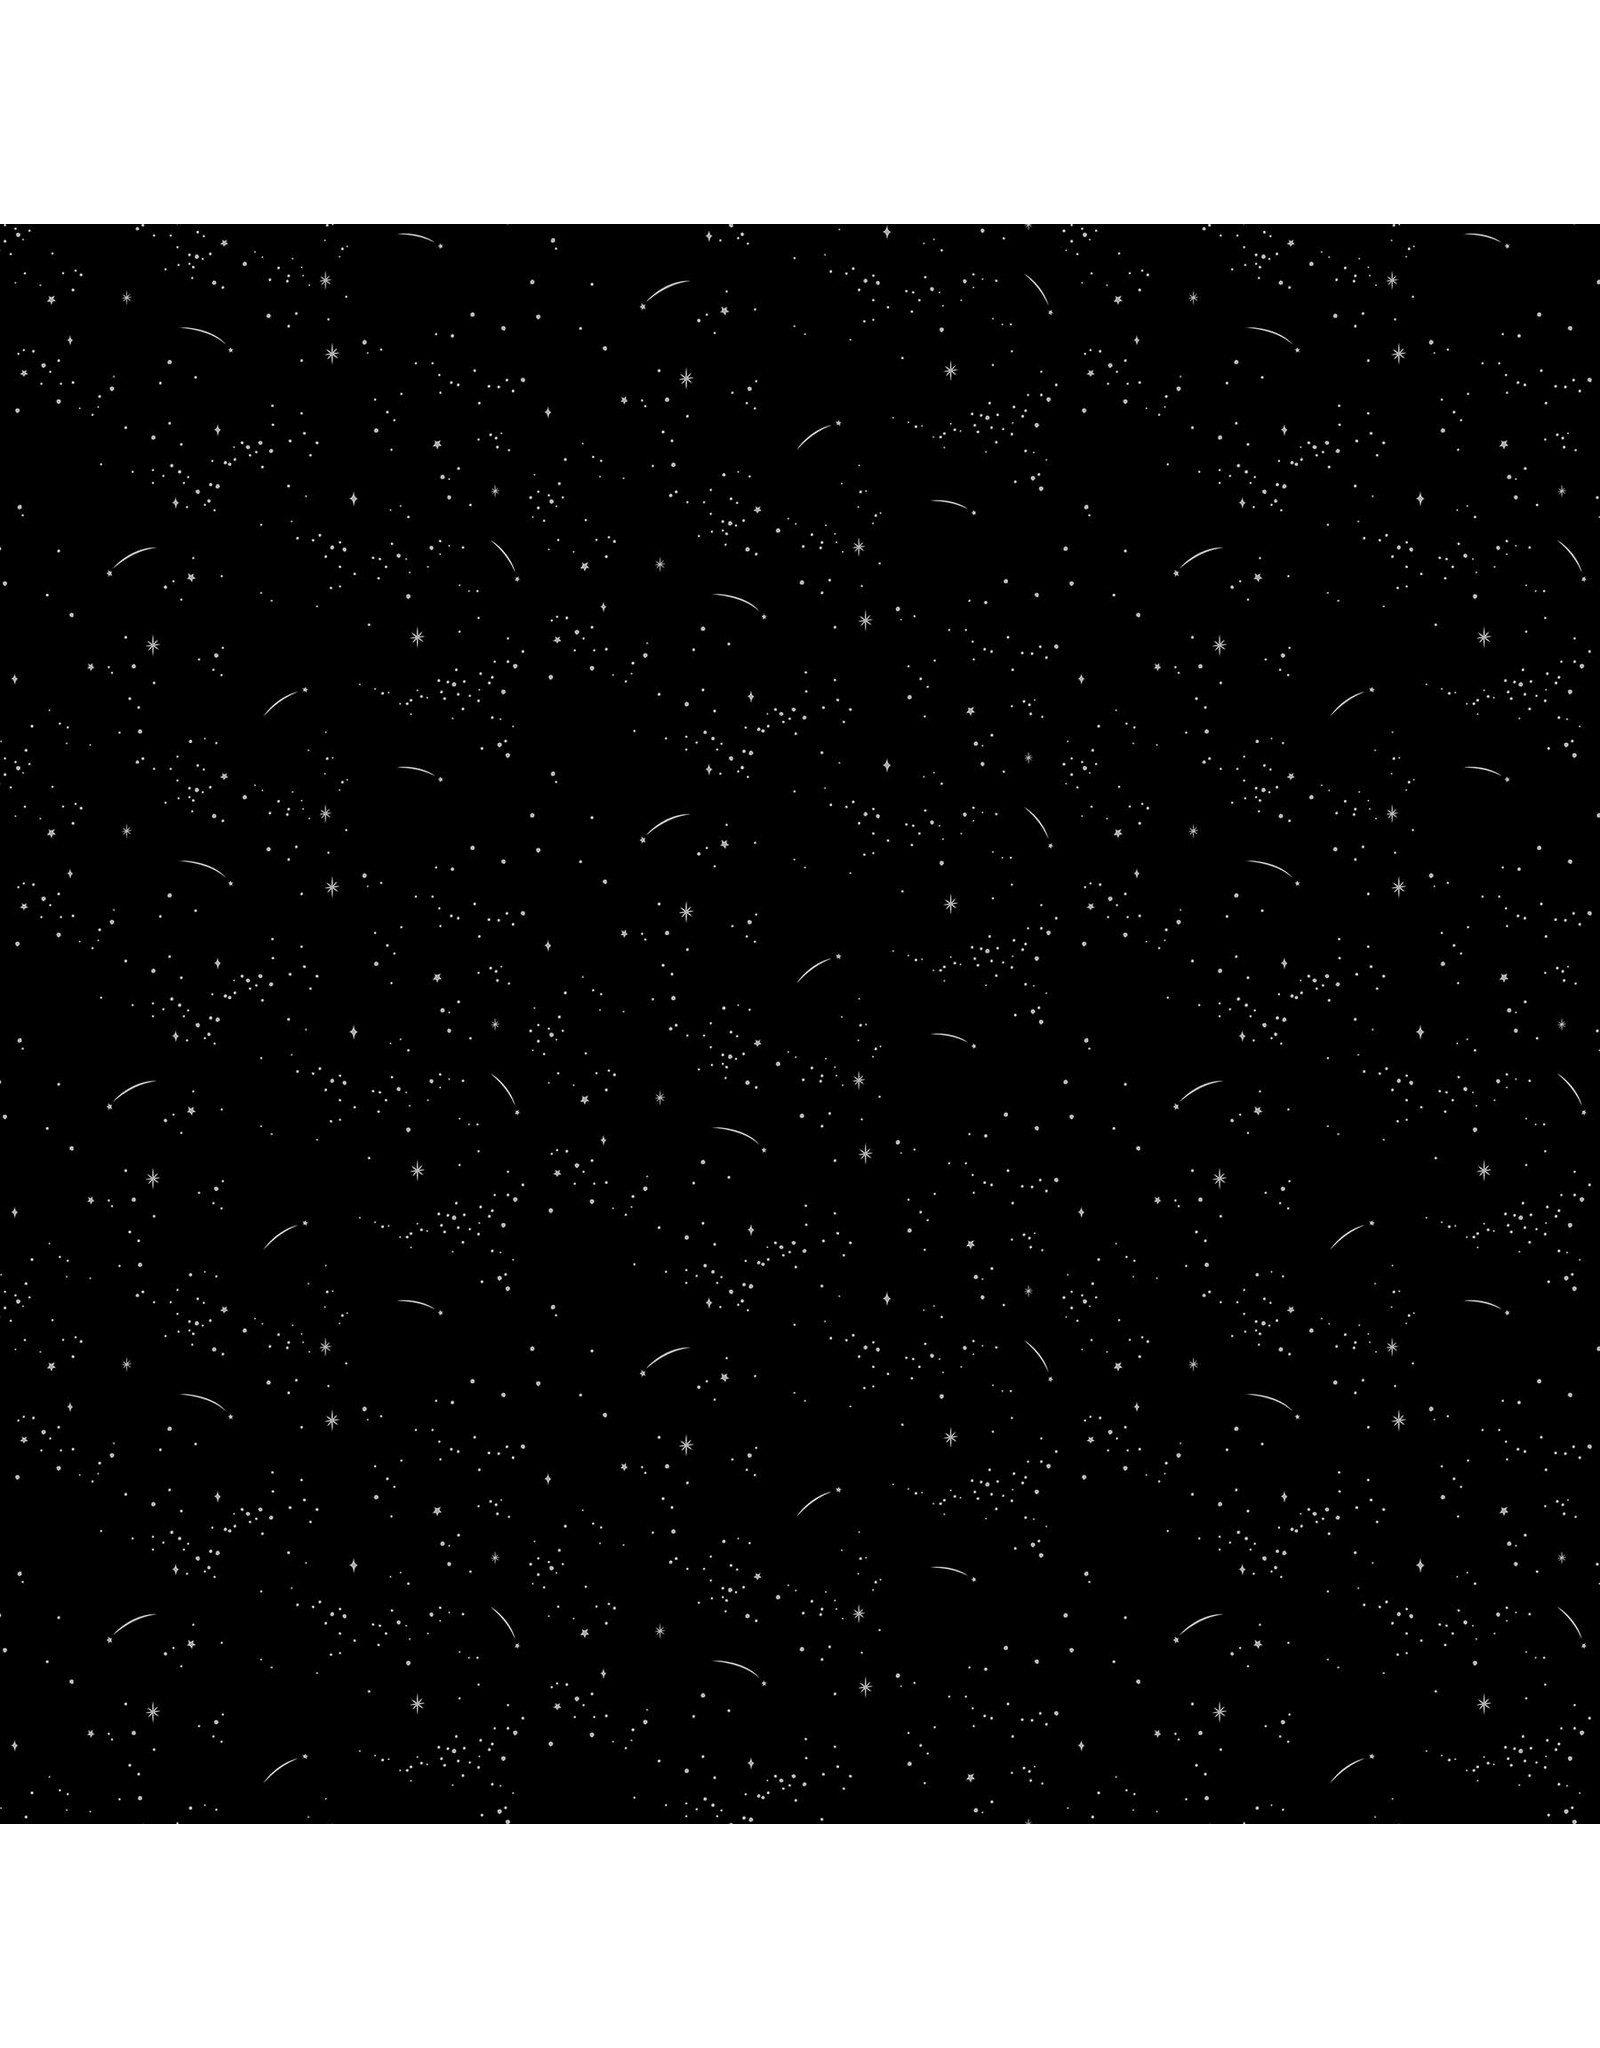 Figo Lucky Charms - Shooting Star Black